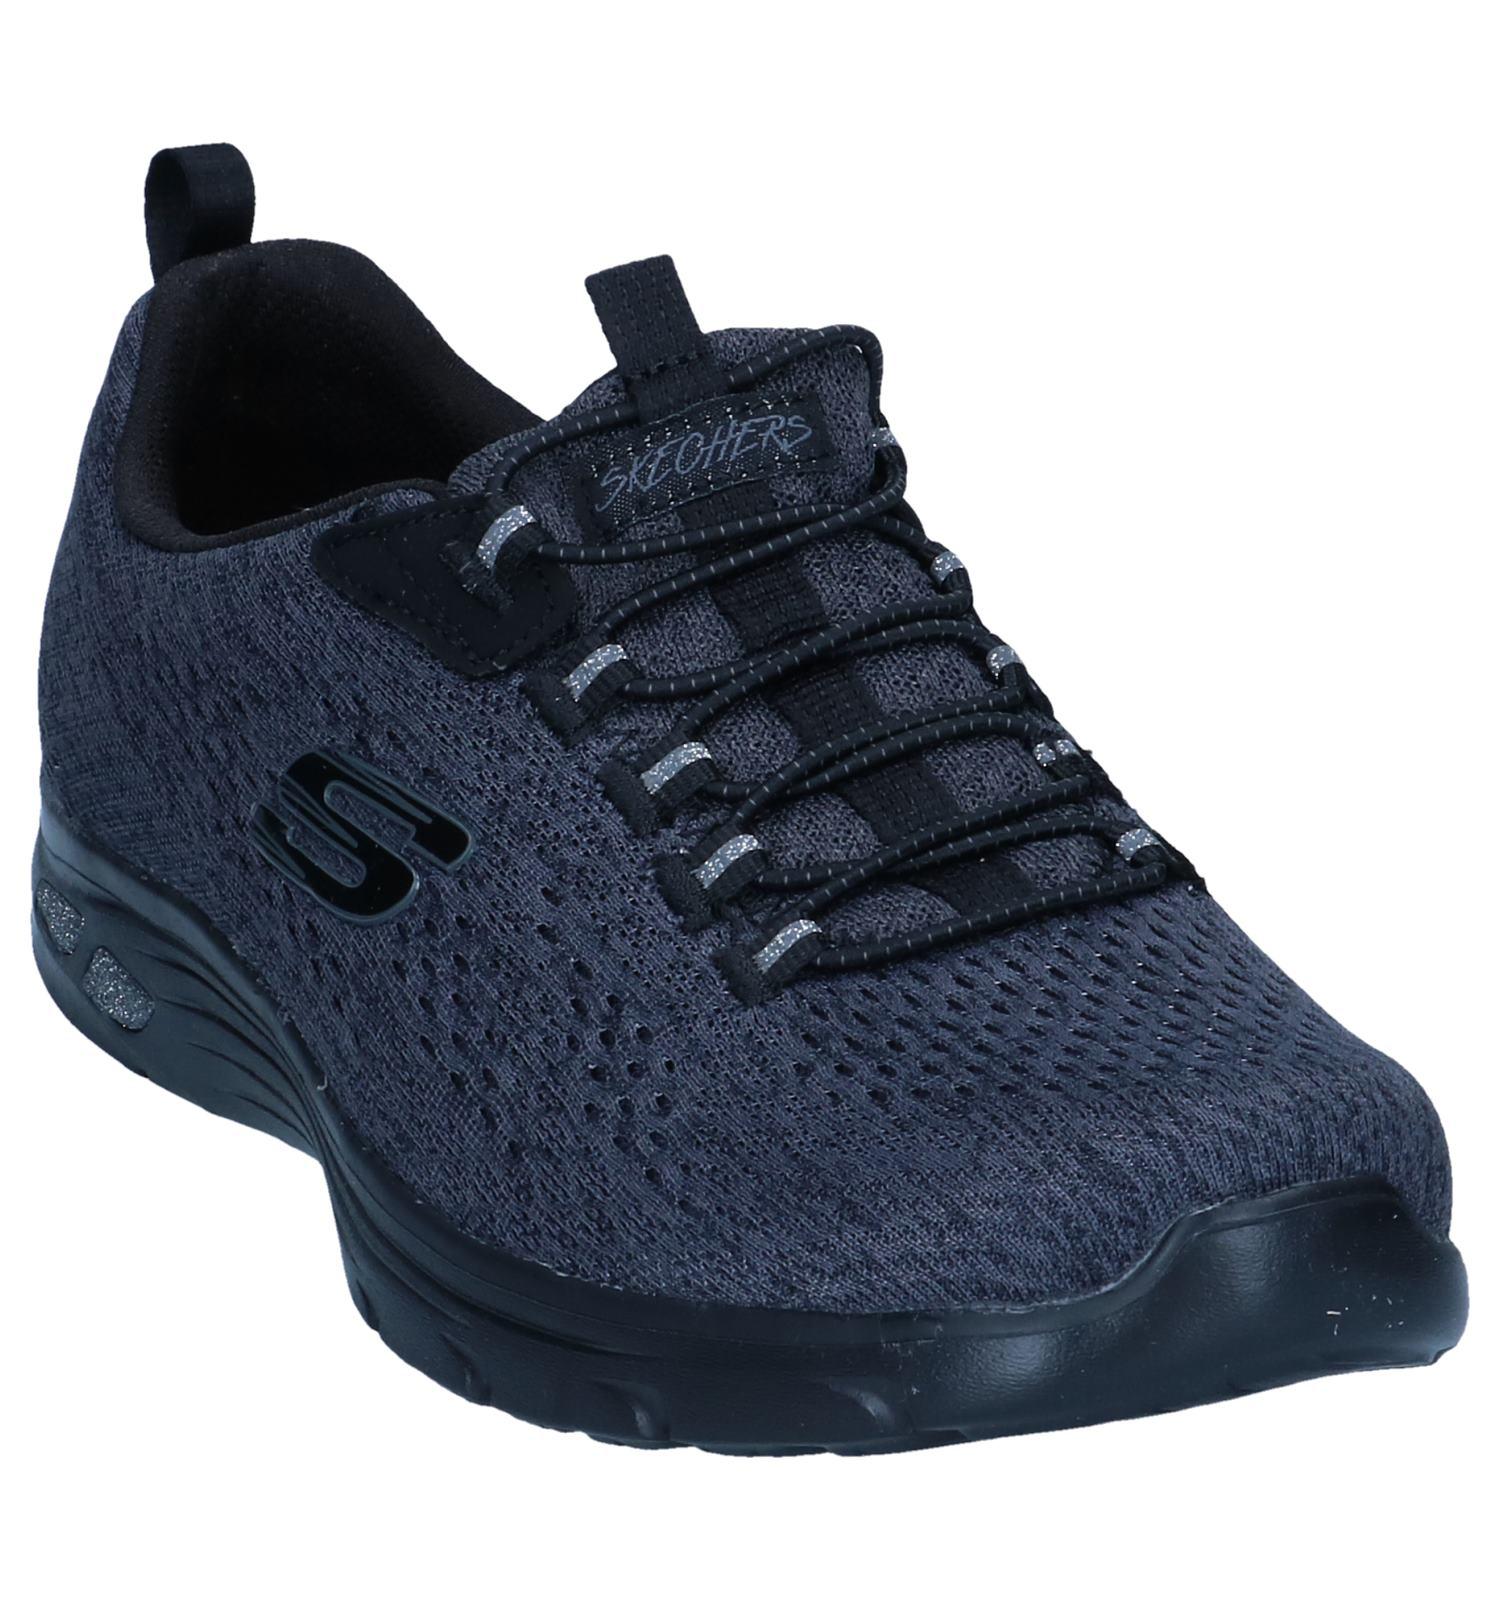 Sneakers Sneakers Empire Empire Skechers Empire Sneakers Donkergrijs Donkergrijs Donkergrijs Skechers Skechers Sneakers c35Rq4AjL